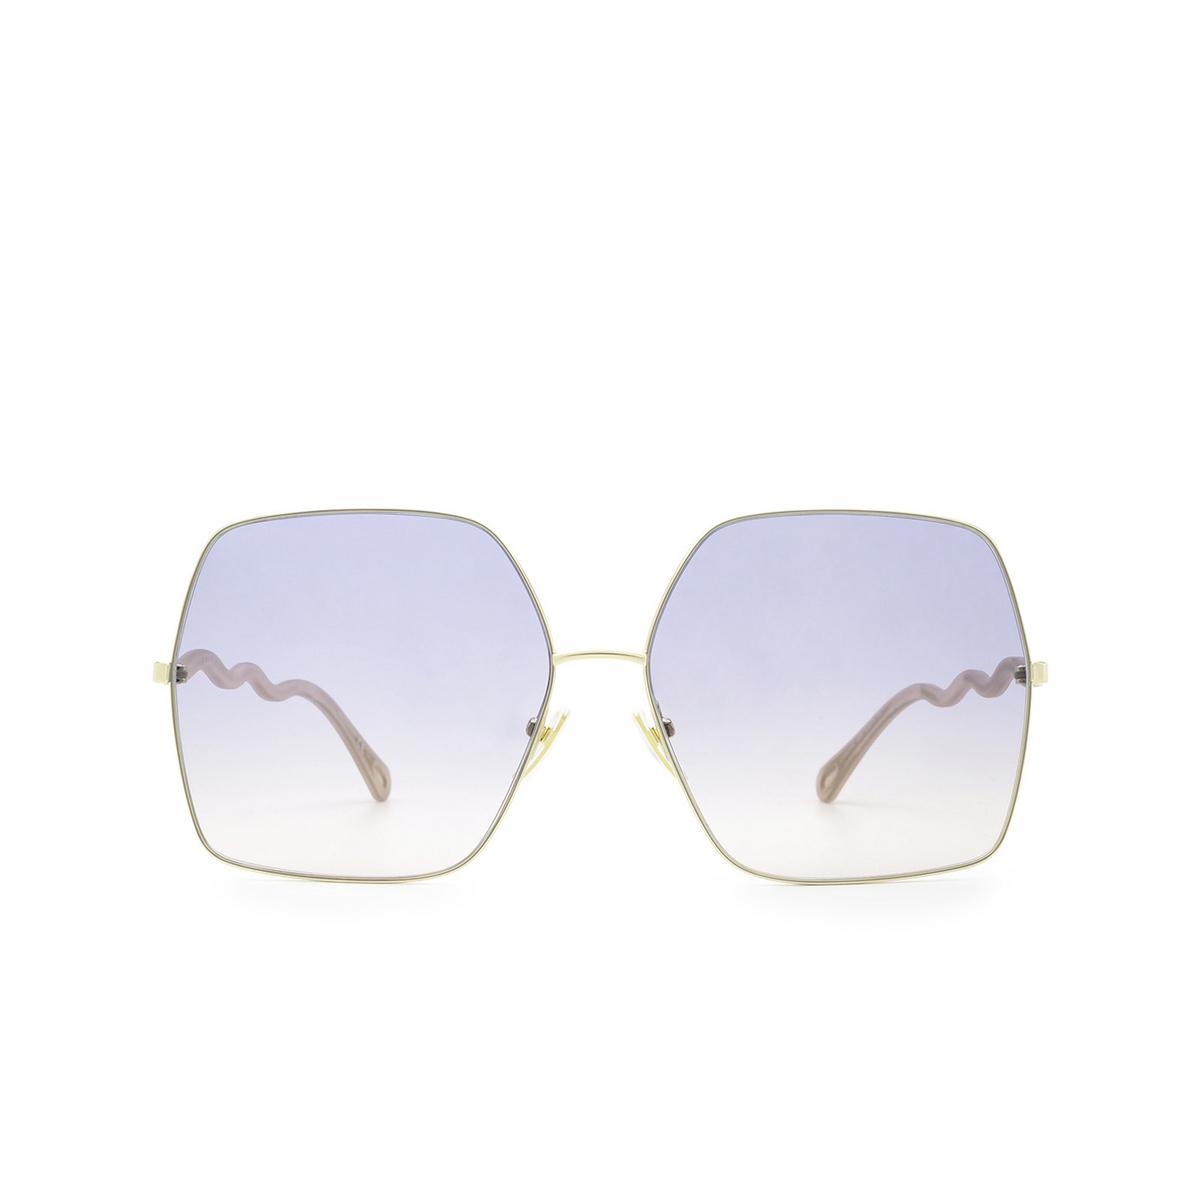 Chloé® Square Sunglasses: CH0054S color Gold 004 - front view.